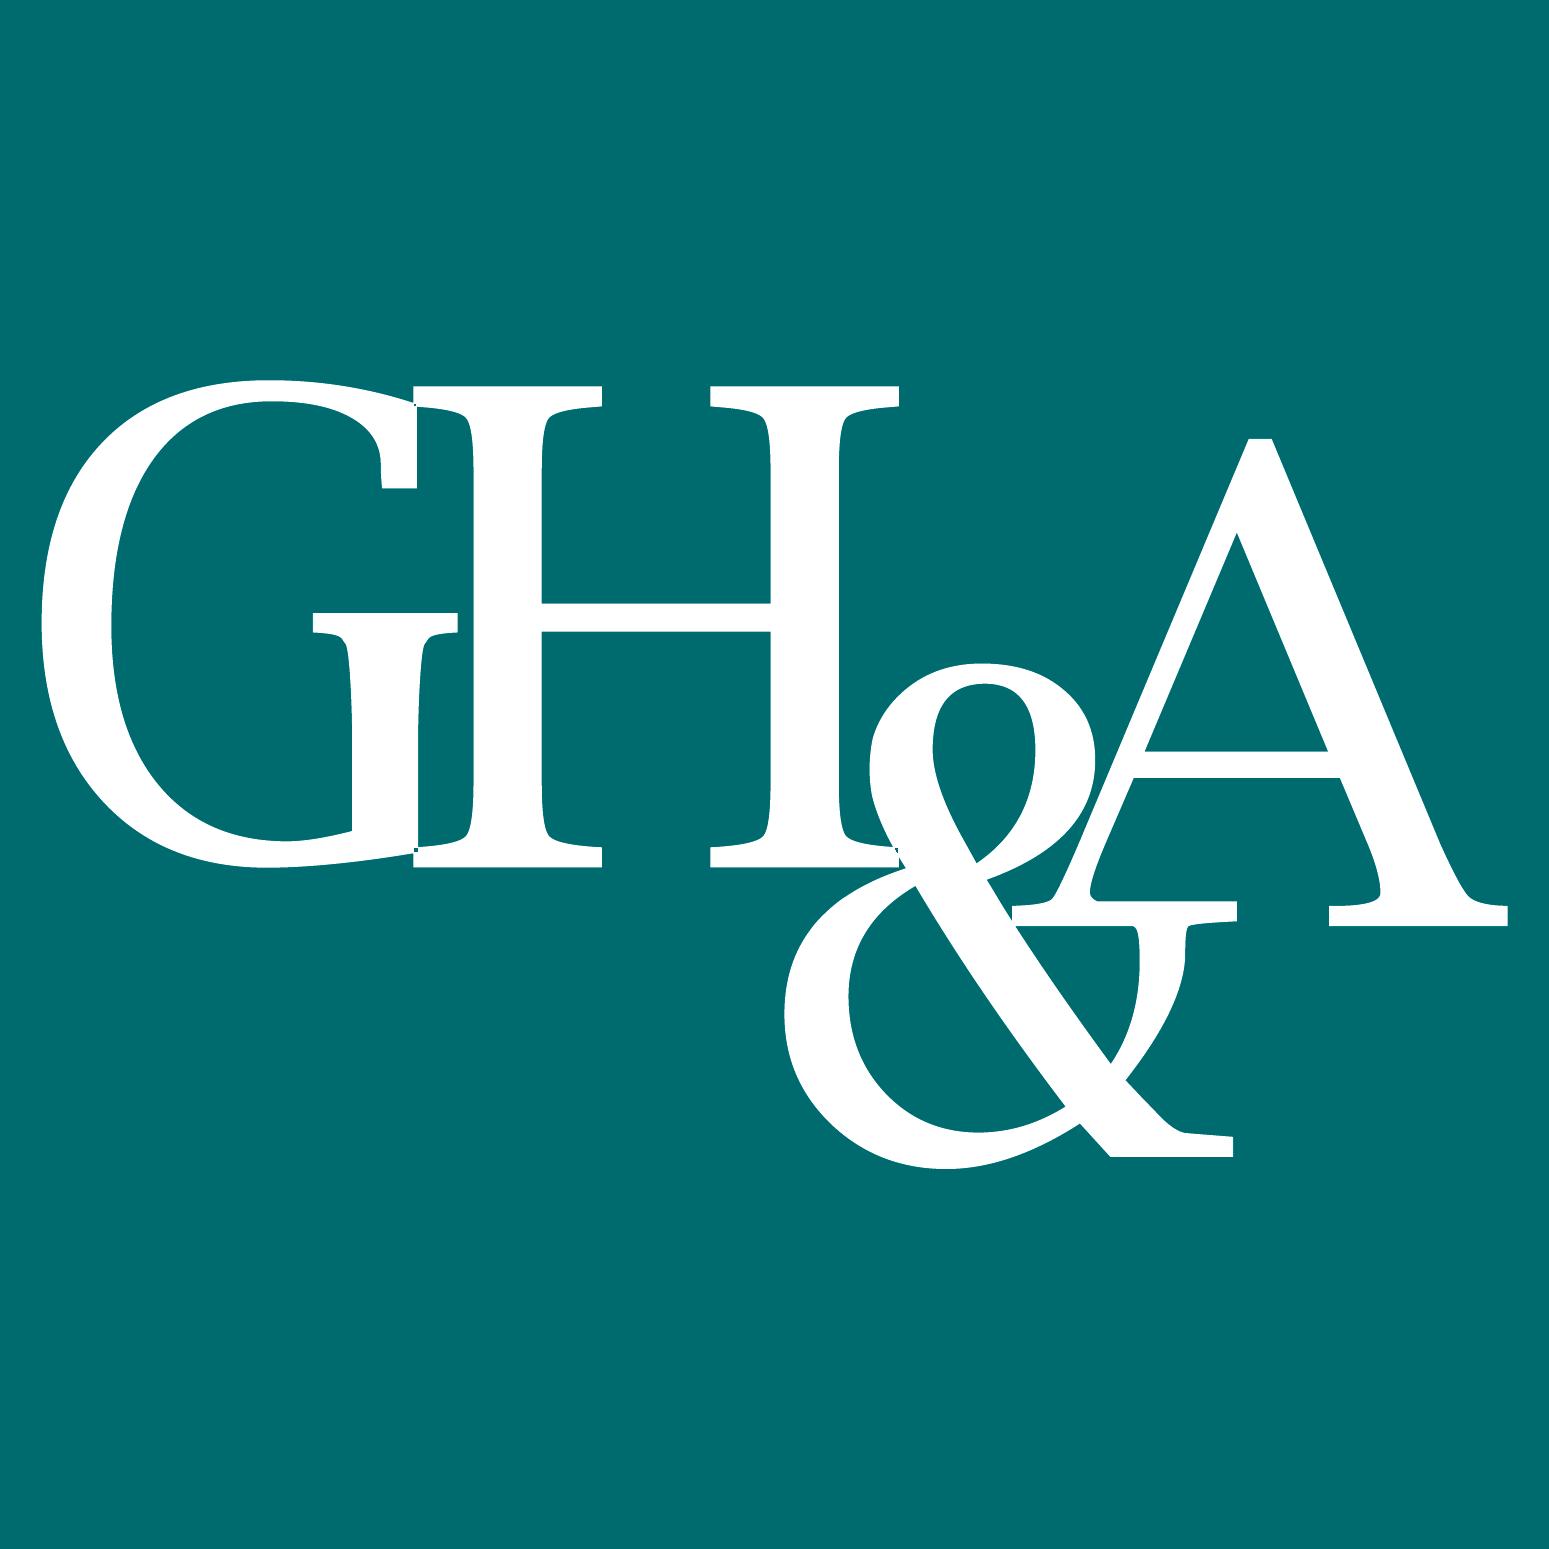 Garcia Hamilton & Associates